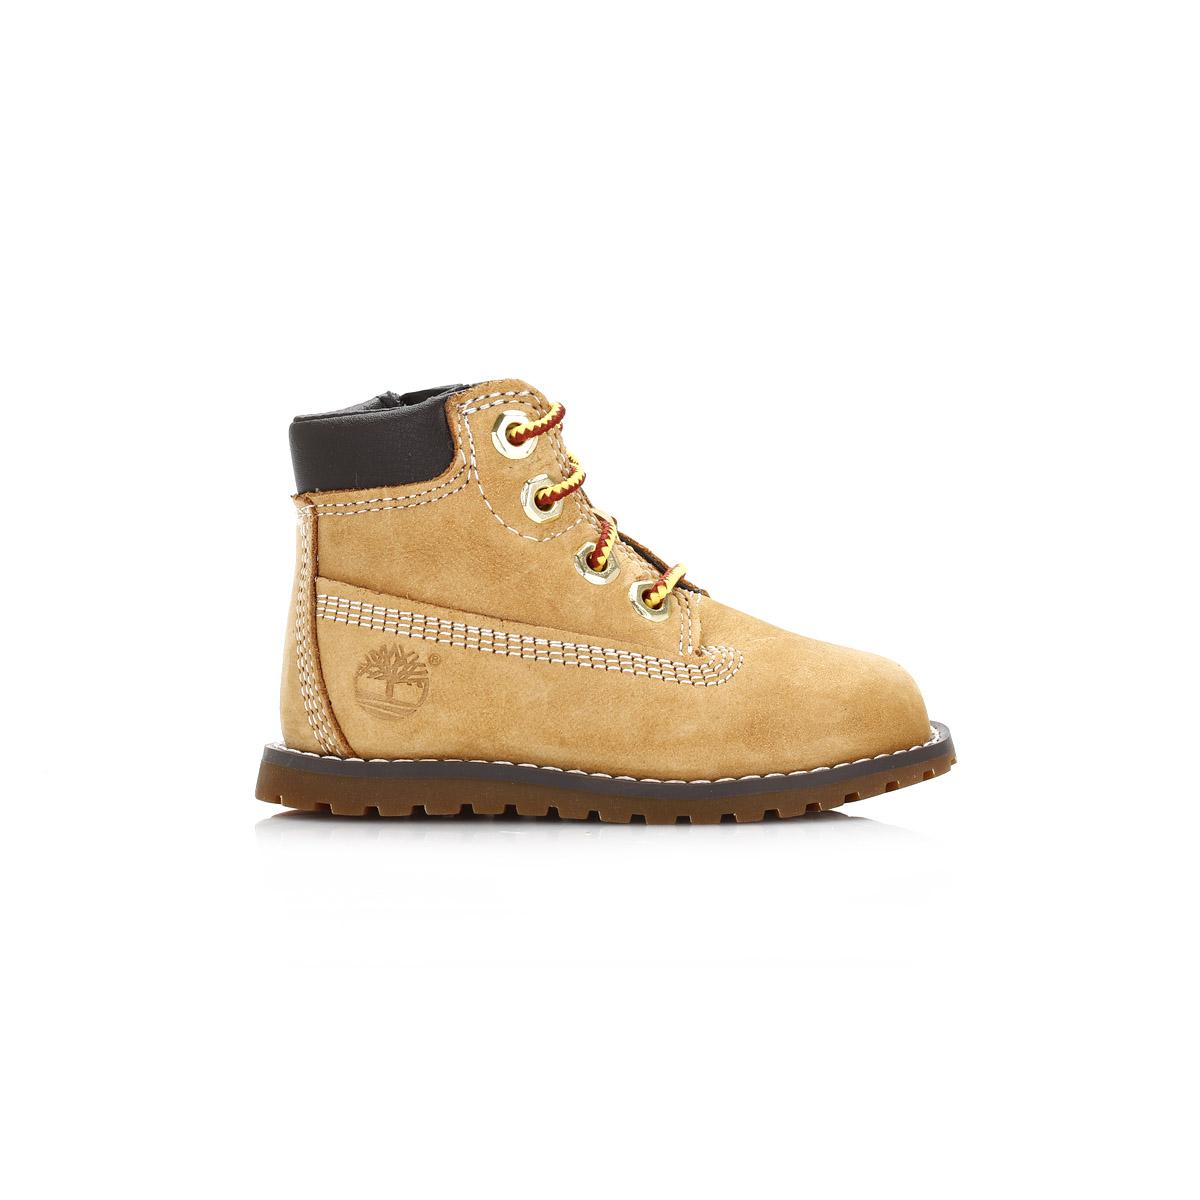 Timberland Toddler Boots Black Nubuck 6 Quot Premium Pokey